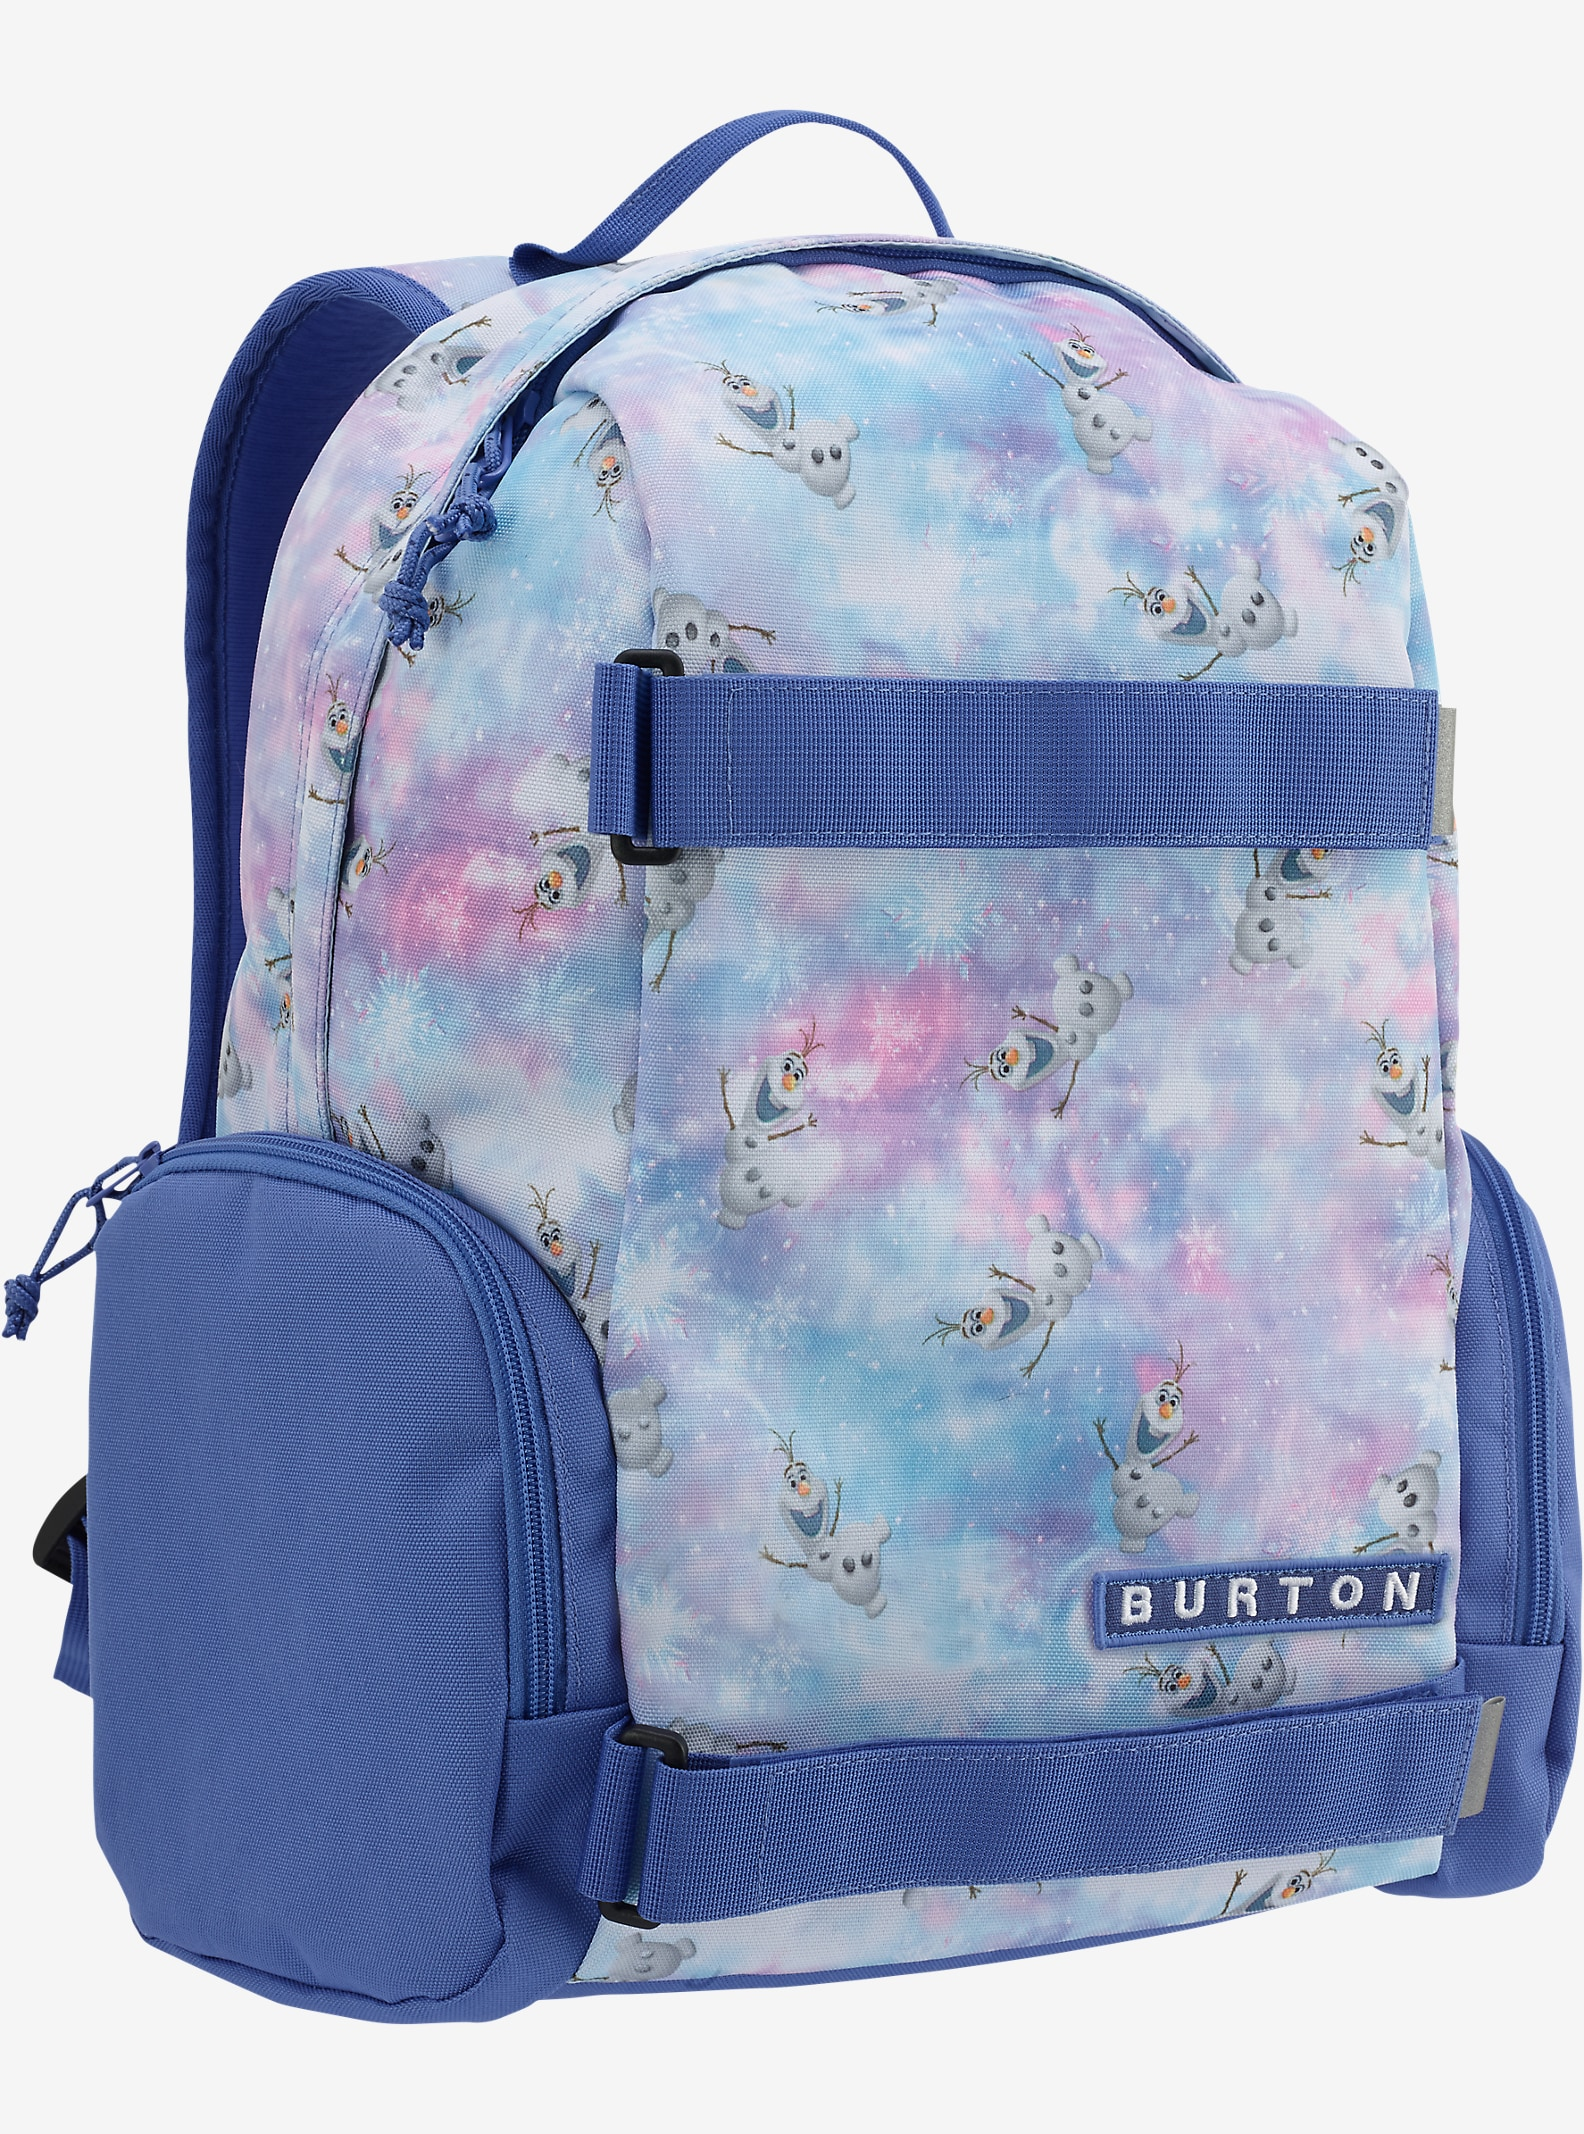 Disney Frozen Kids' Emphasis Backpack shown in Olaf Frozen Print © Disney